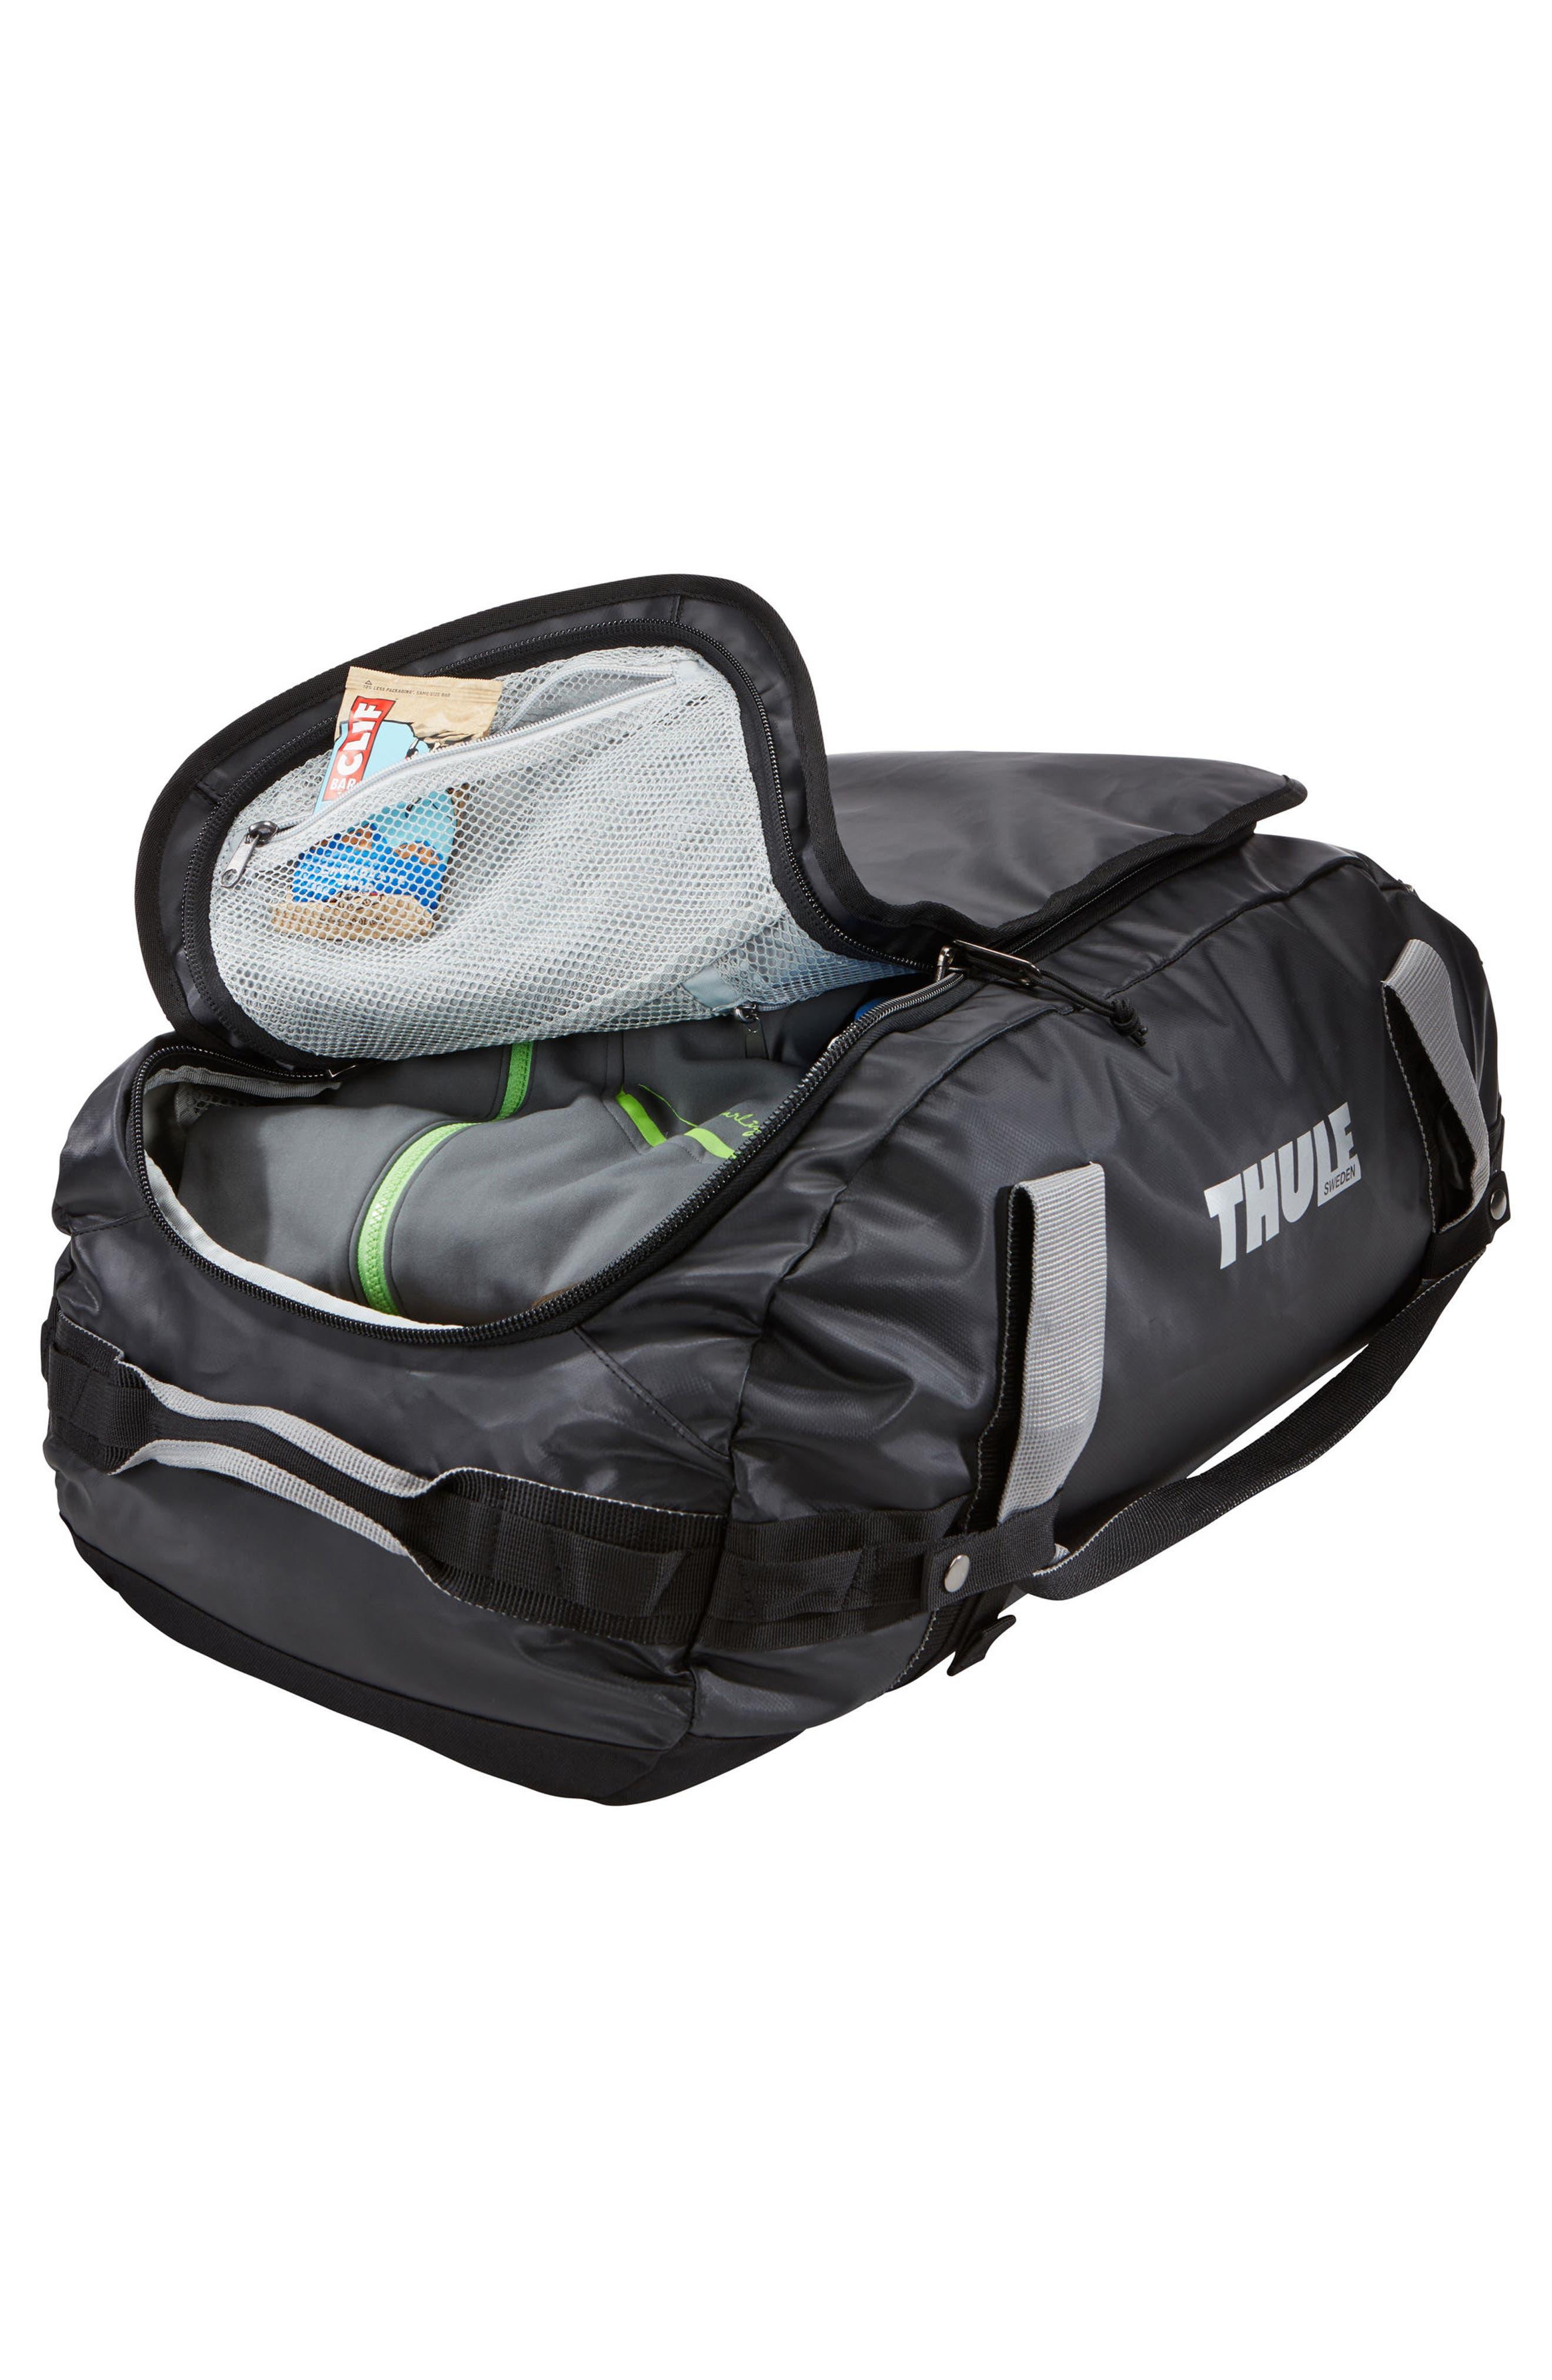 Chasm 130-Liter Convertible Duffel Bag,                             Alternate thumbnail 2, color,                             BLACK